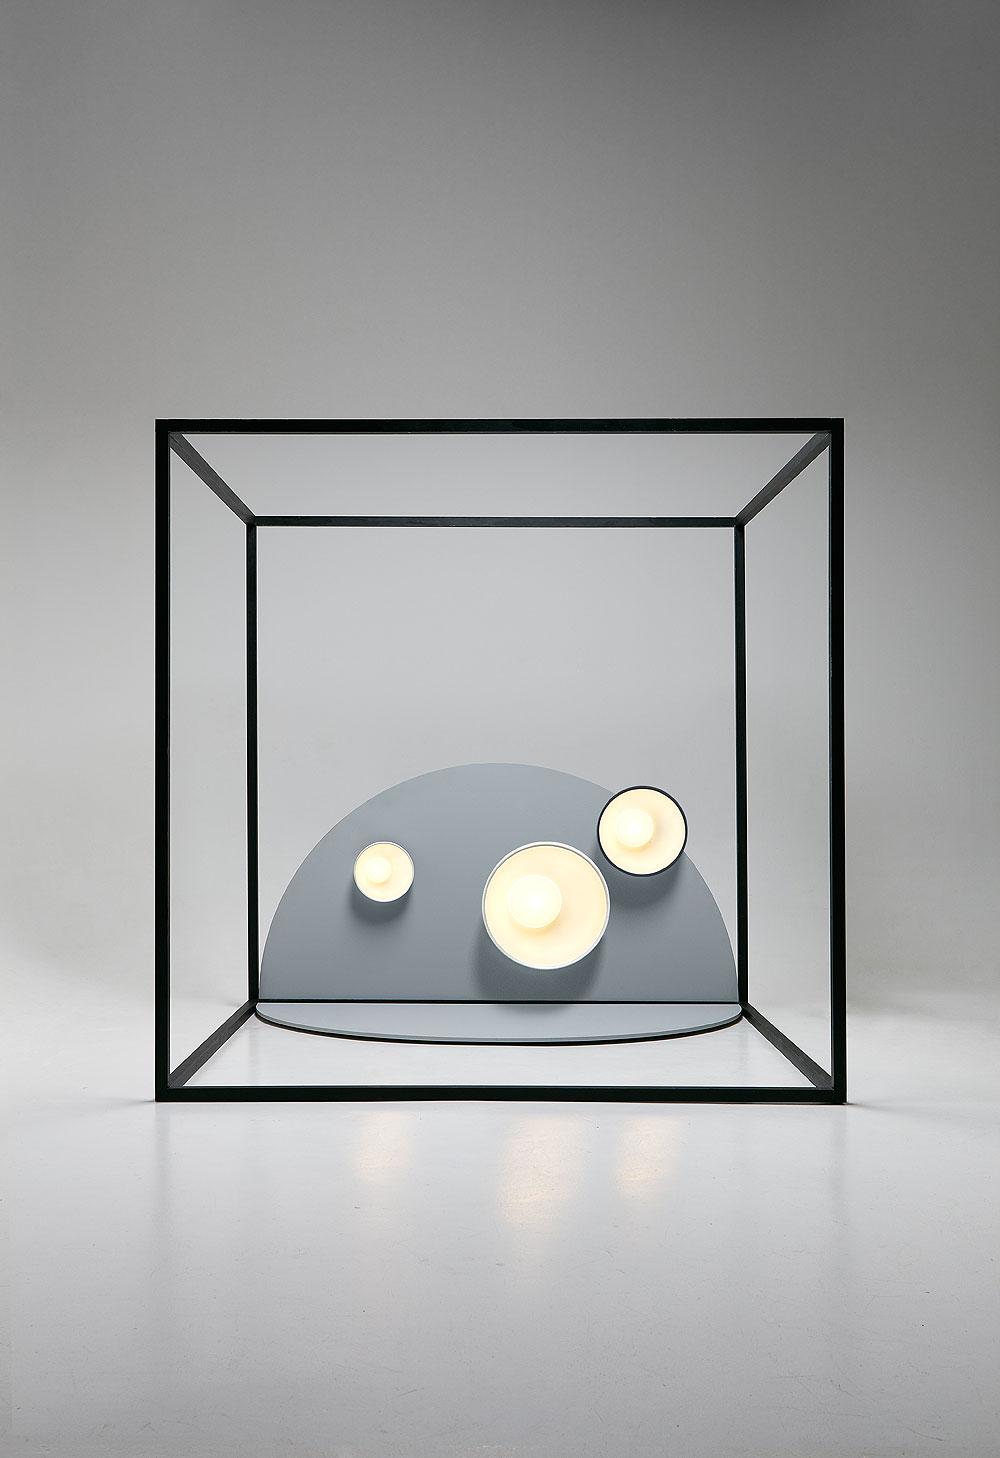 sun-lighting-yonoh-marset (1)